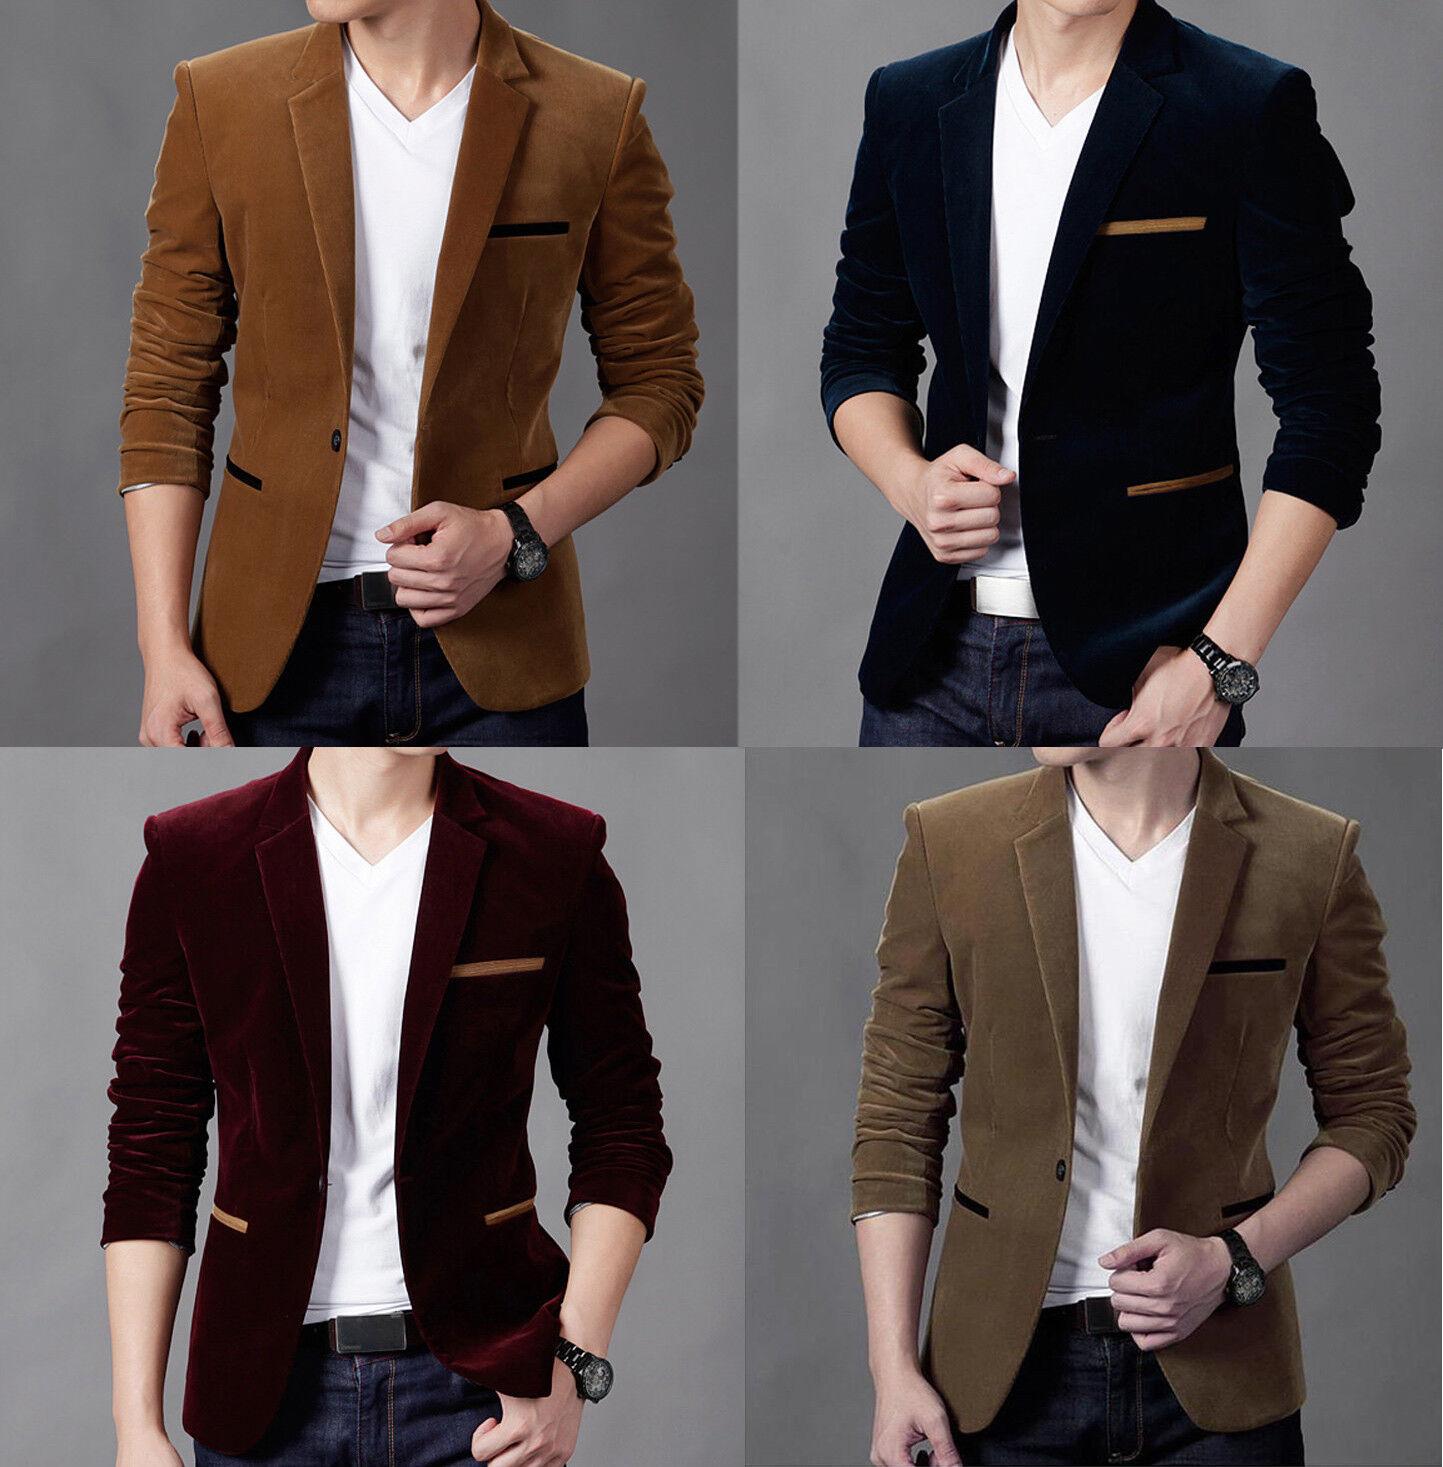 Charm Mens Casual Slim Fit One Button Suit Blazer Classic Blazer Coat Formal Jacket Tops Men Fashion